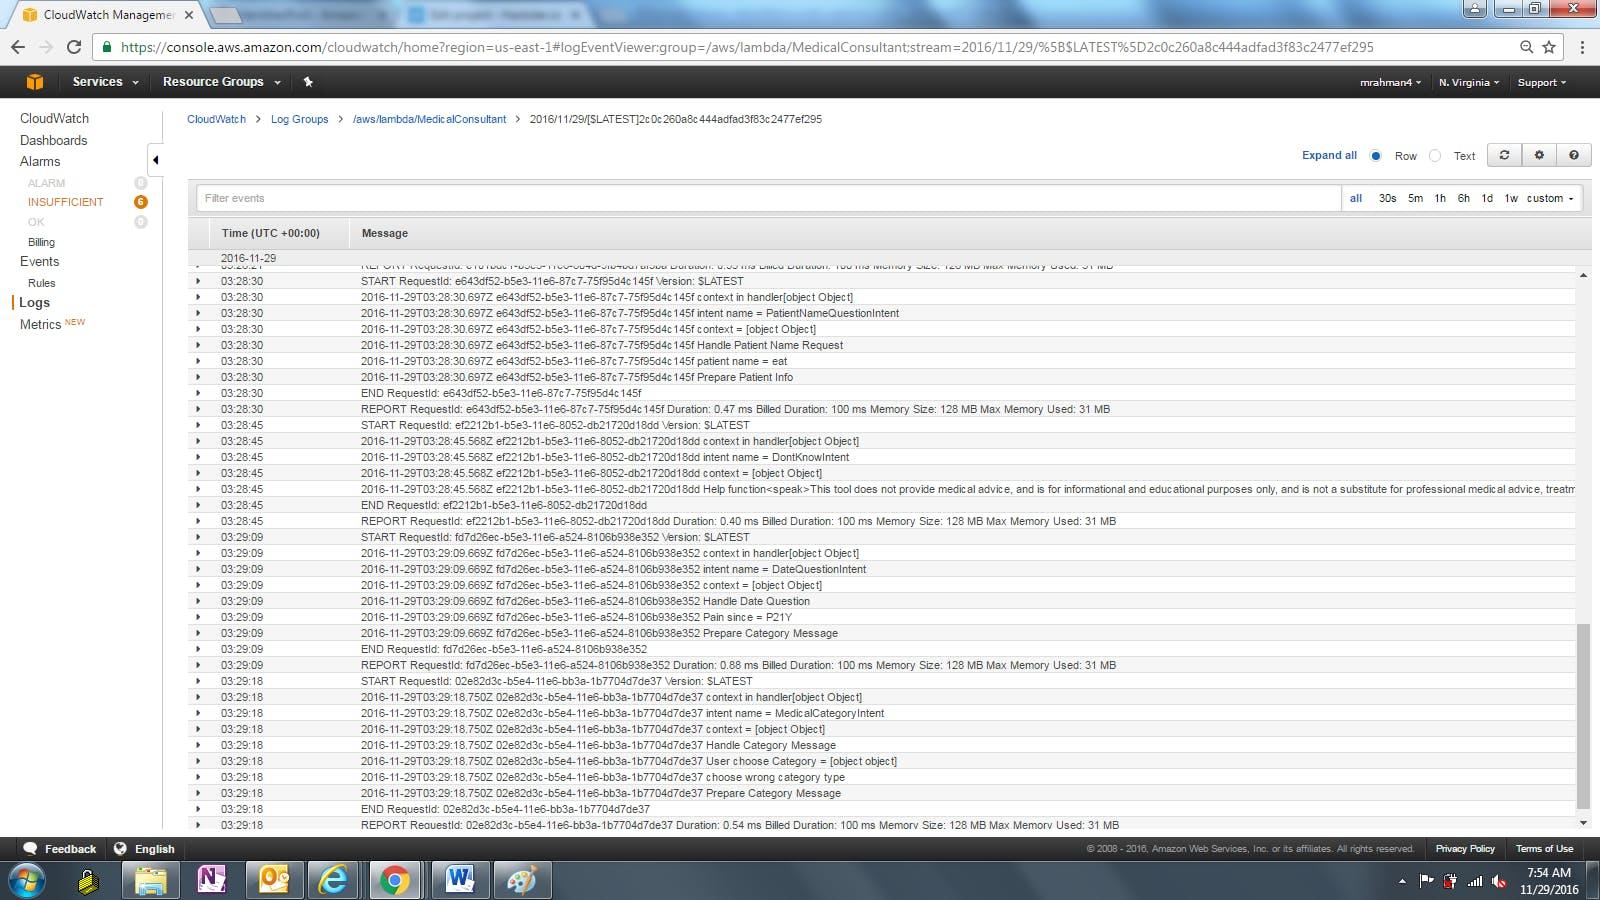 CloudWatch logs